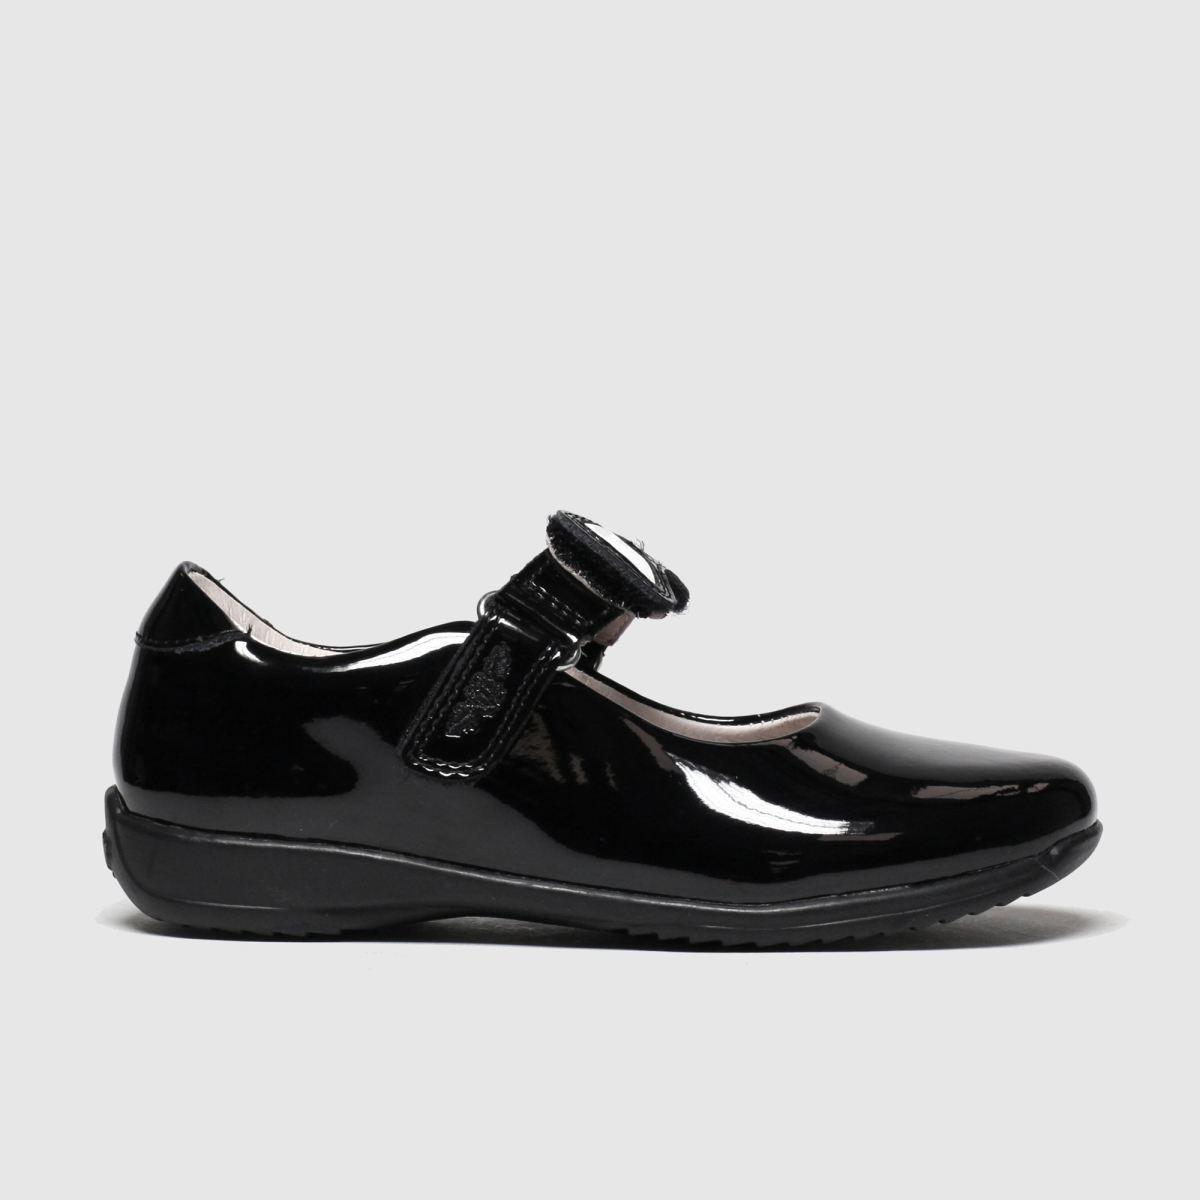 Lelli Kelly Black Colourissima Bow Shoes Junior